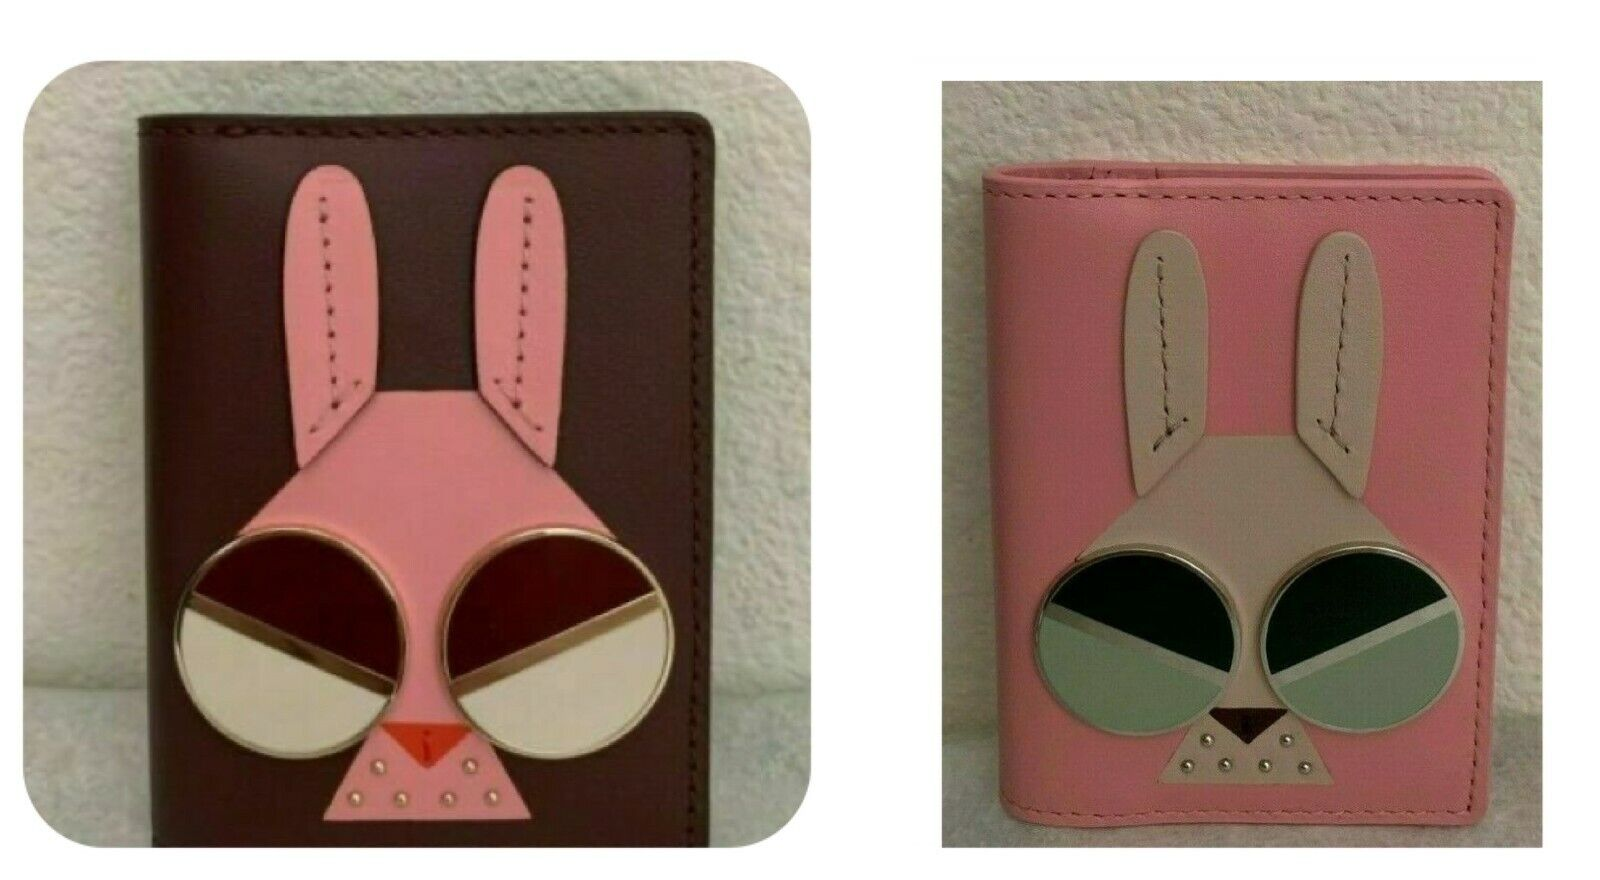 NWT Kate Spade Spademals Money Bunny Bifold Card Case PWRU7521